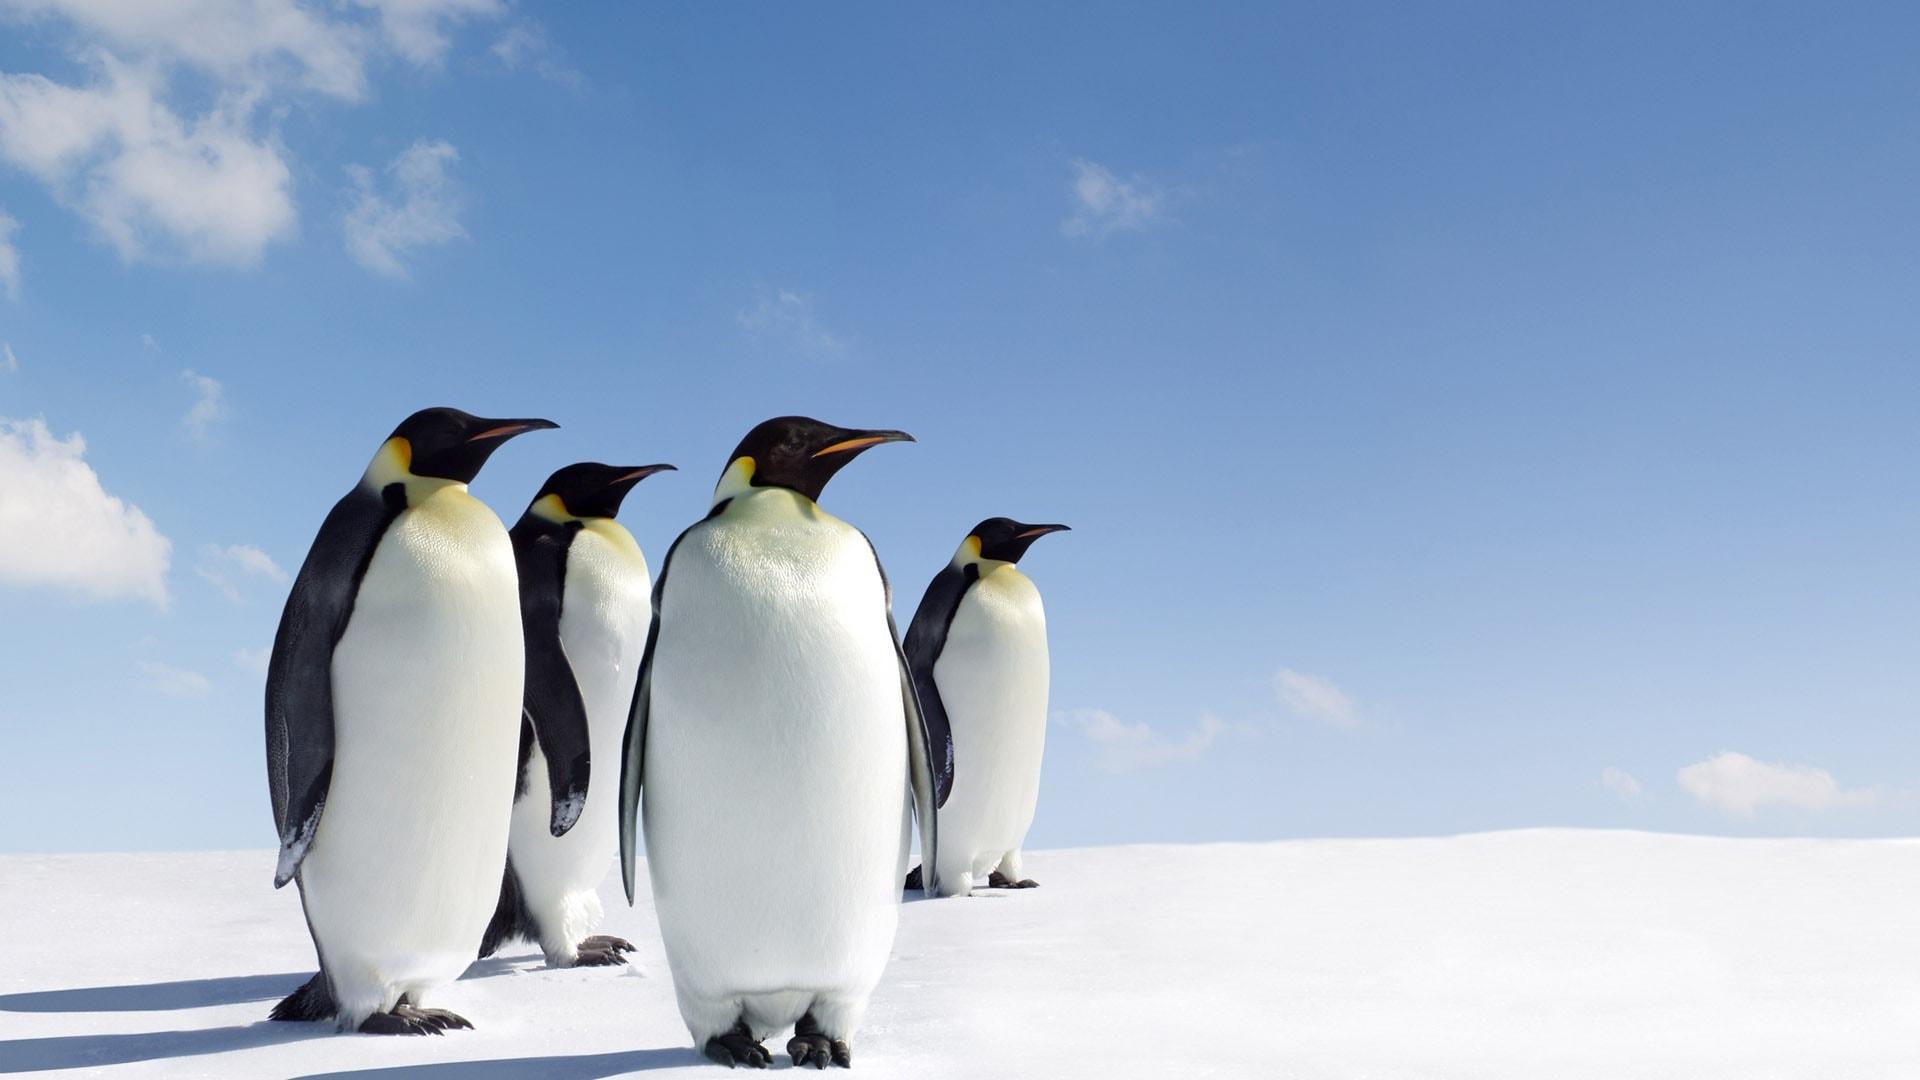 Penguin Wallpapers - Penguin Wallpaper Hd , HD Wallpaper & Backgrounds